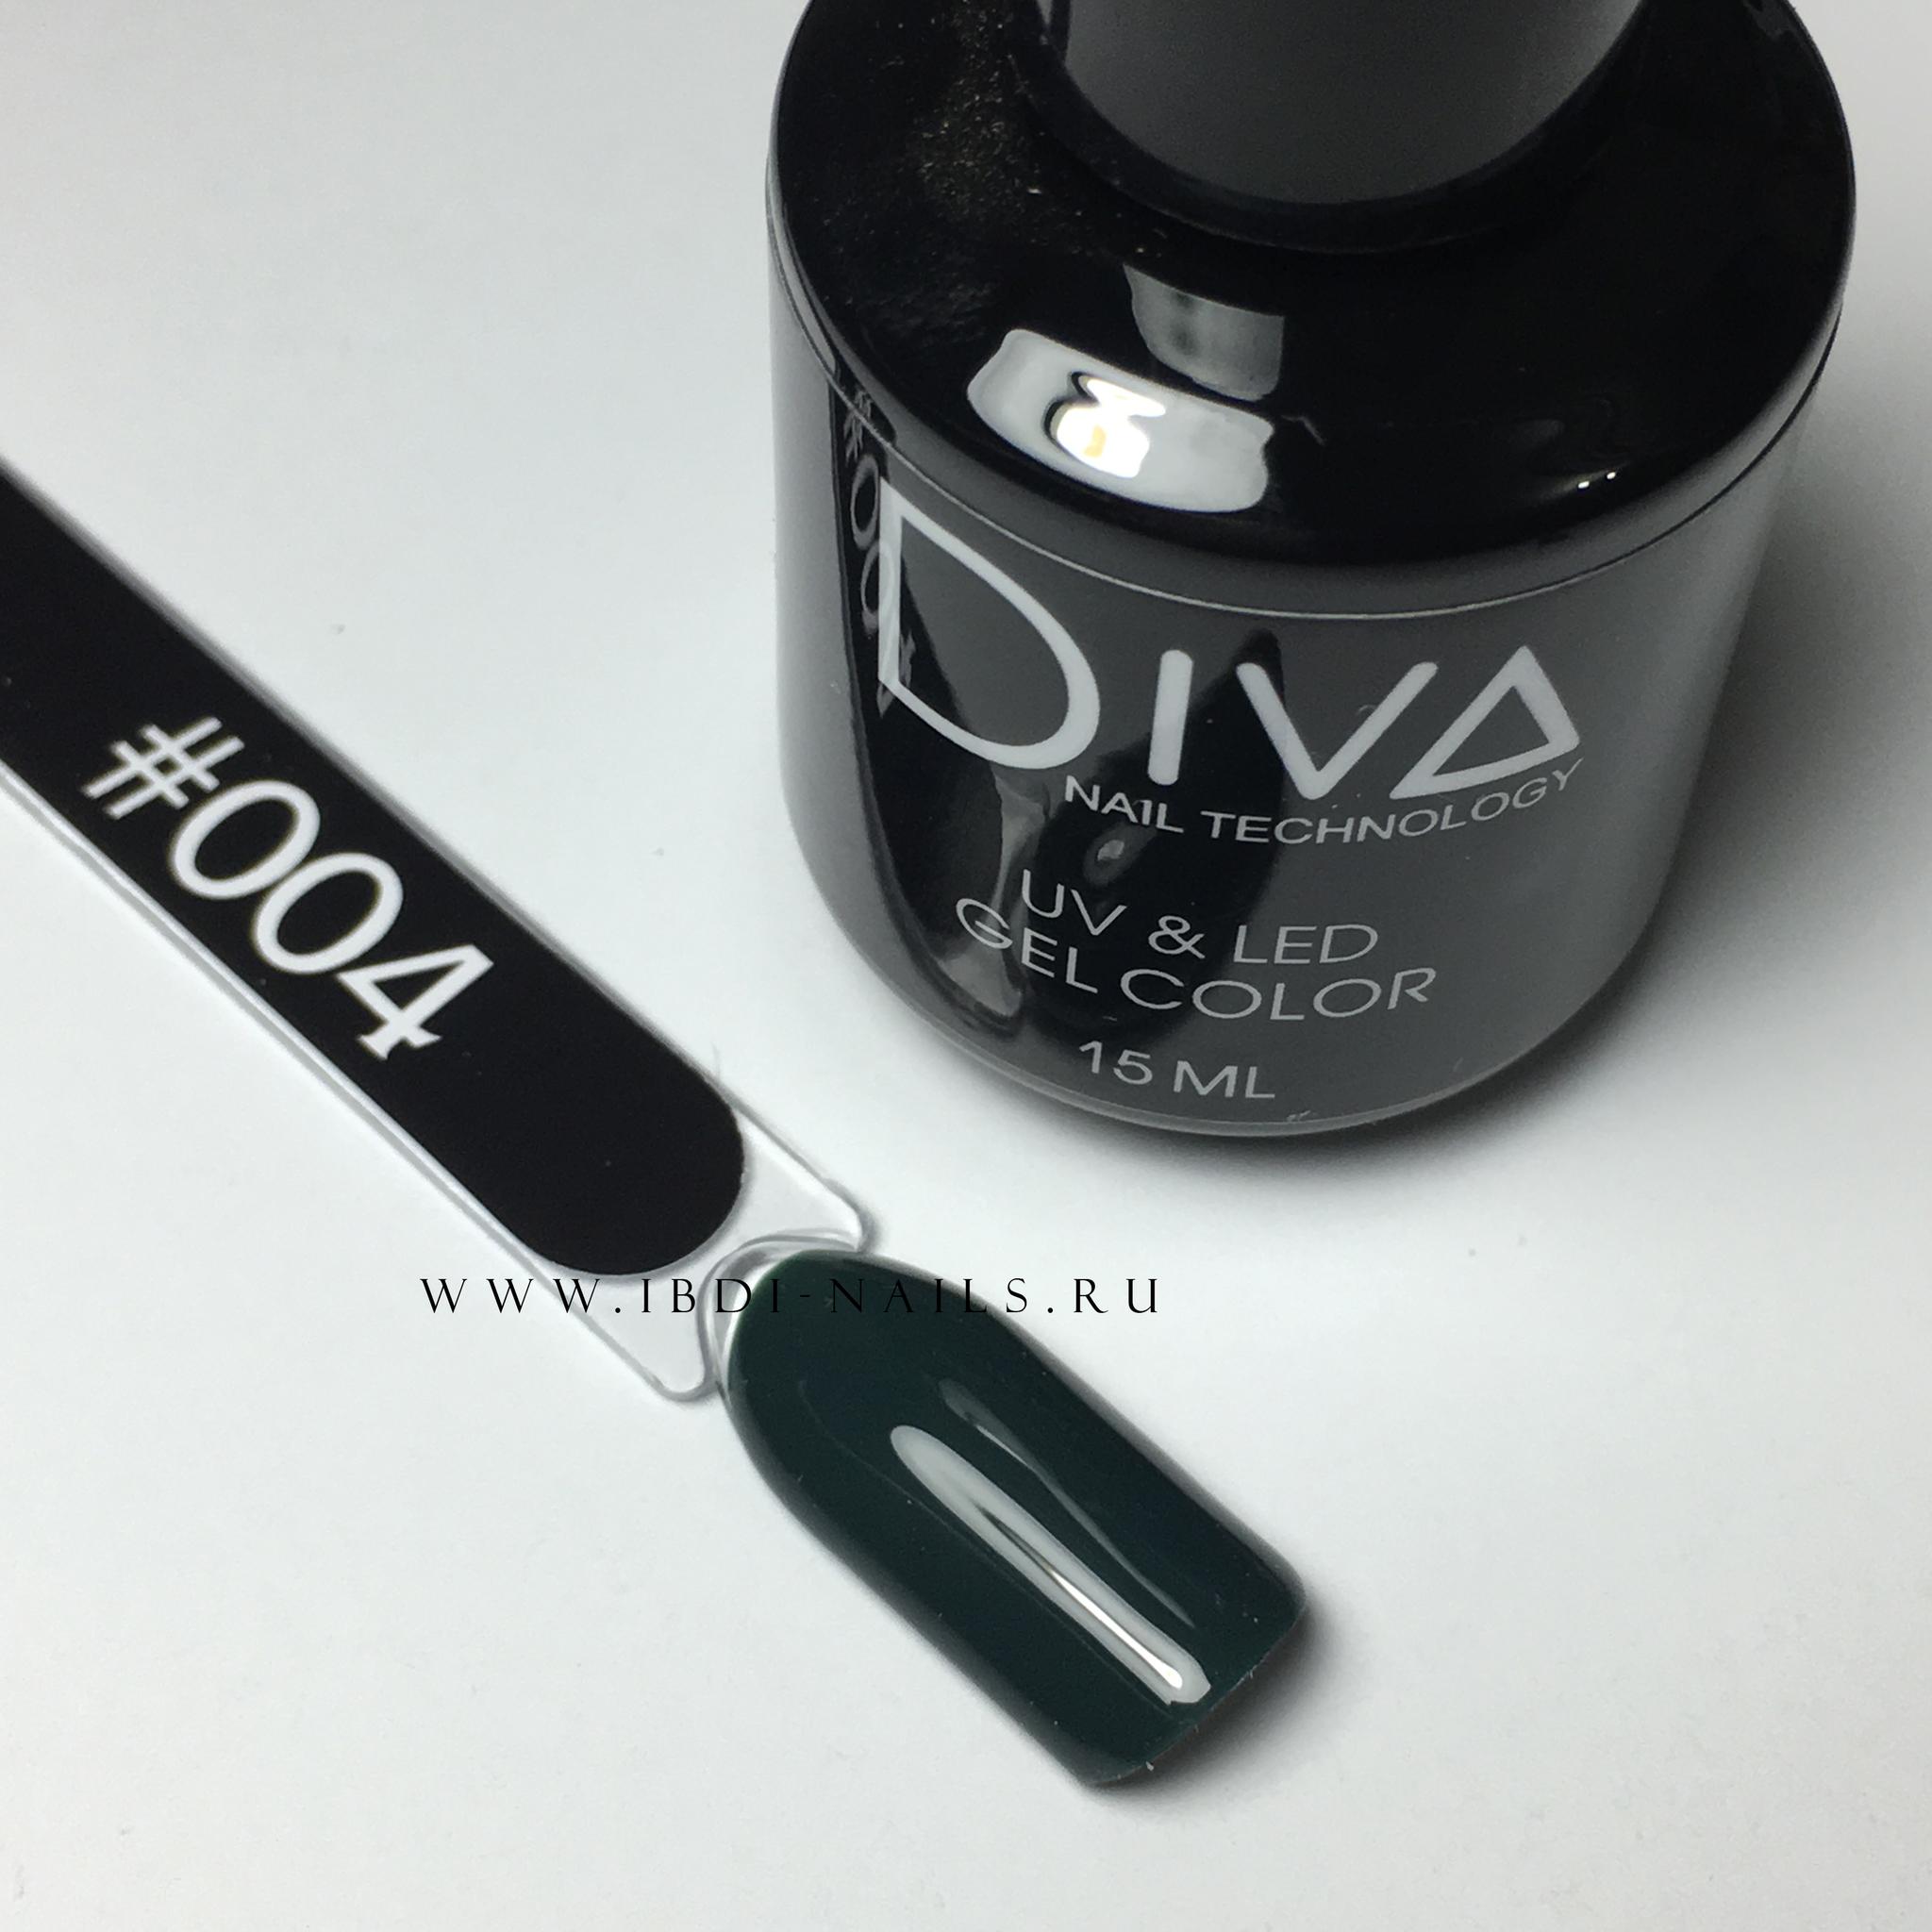 Гель-лак DIVA 004 15мл